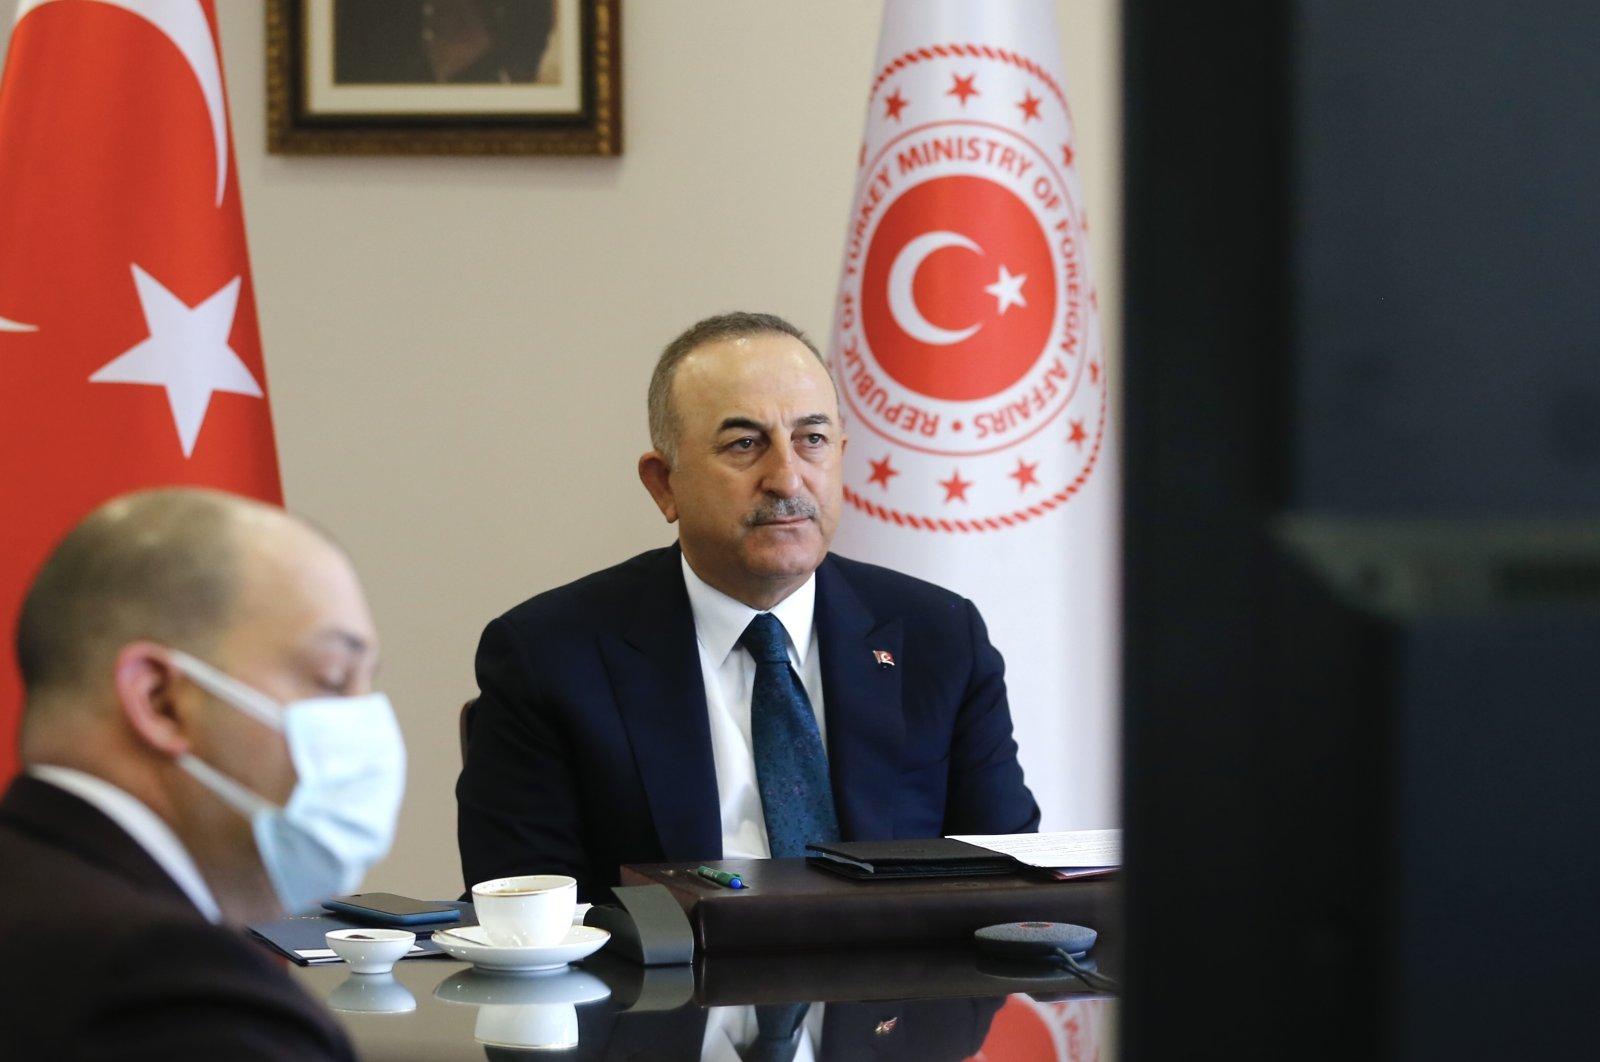 Foreign Minister Mevlüt Çavuşoğlu attends the D-8 meeting via videoconference in Ankara, Turkey, April 7, 2021 (AA Photo)